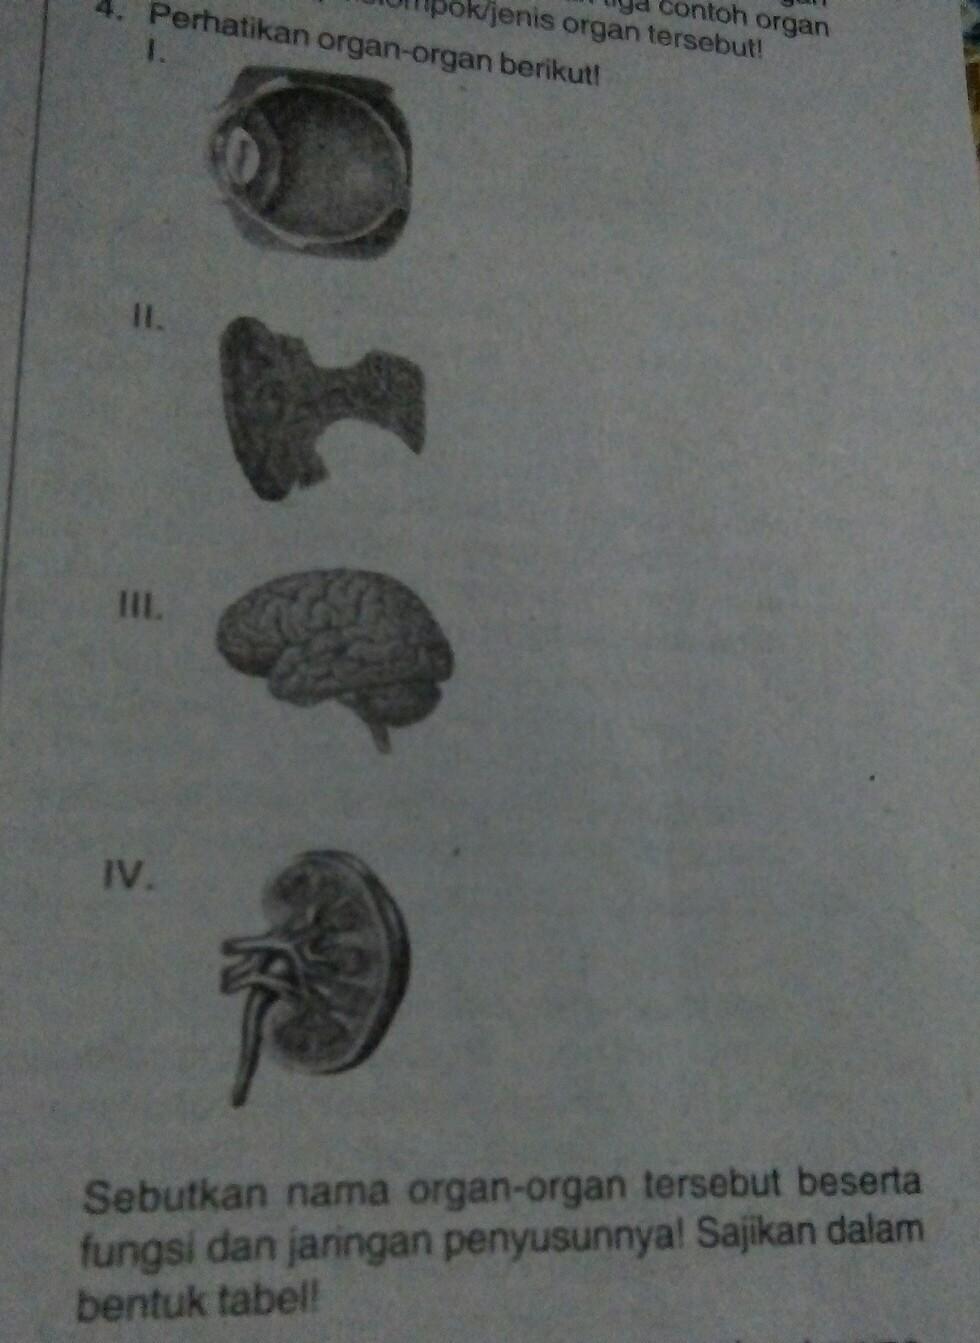 Sebutkan Nama Anggota Tubuh Manusia Dan Fungsinya : sebutkan, anggota, tubuh, manusia, fungsinya, Sebutkan, Organ, Tersebut, Beserta, Fungsi, Jaringan, Penyusunnya!, Brainly.co.id